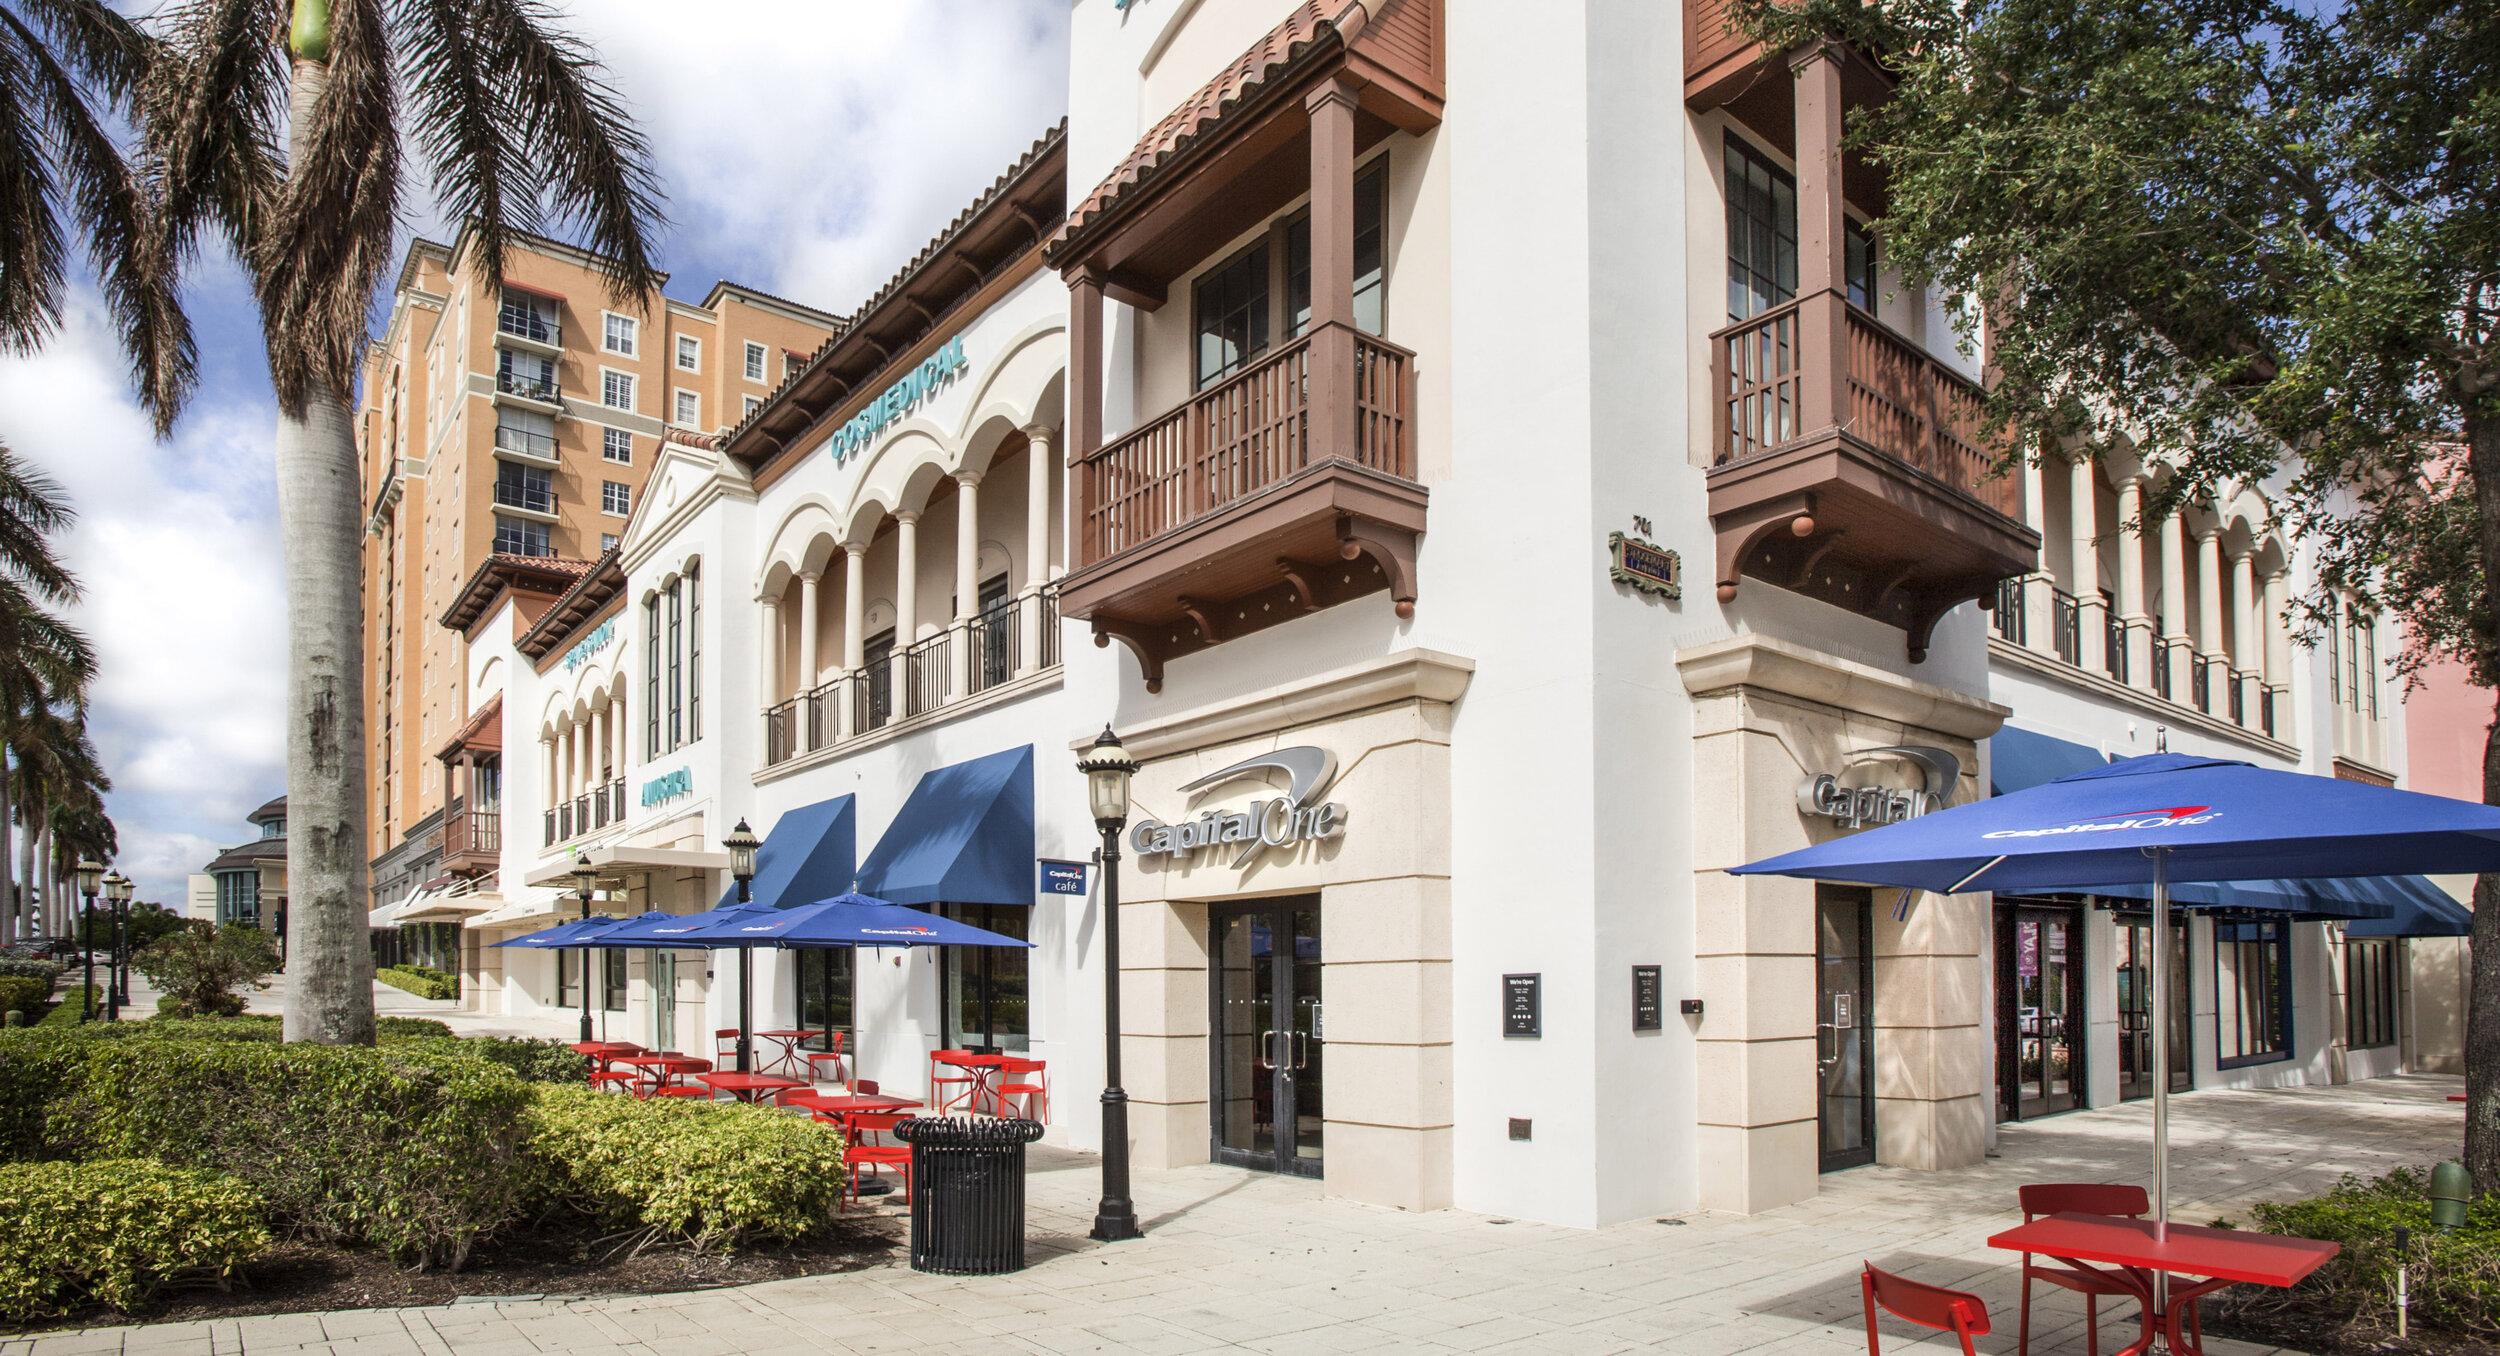 West Palm (Miami) FL 701 S Rosemary Avenue, Suite 101.jpg